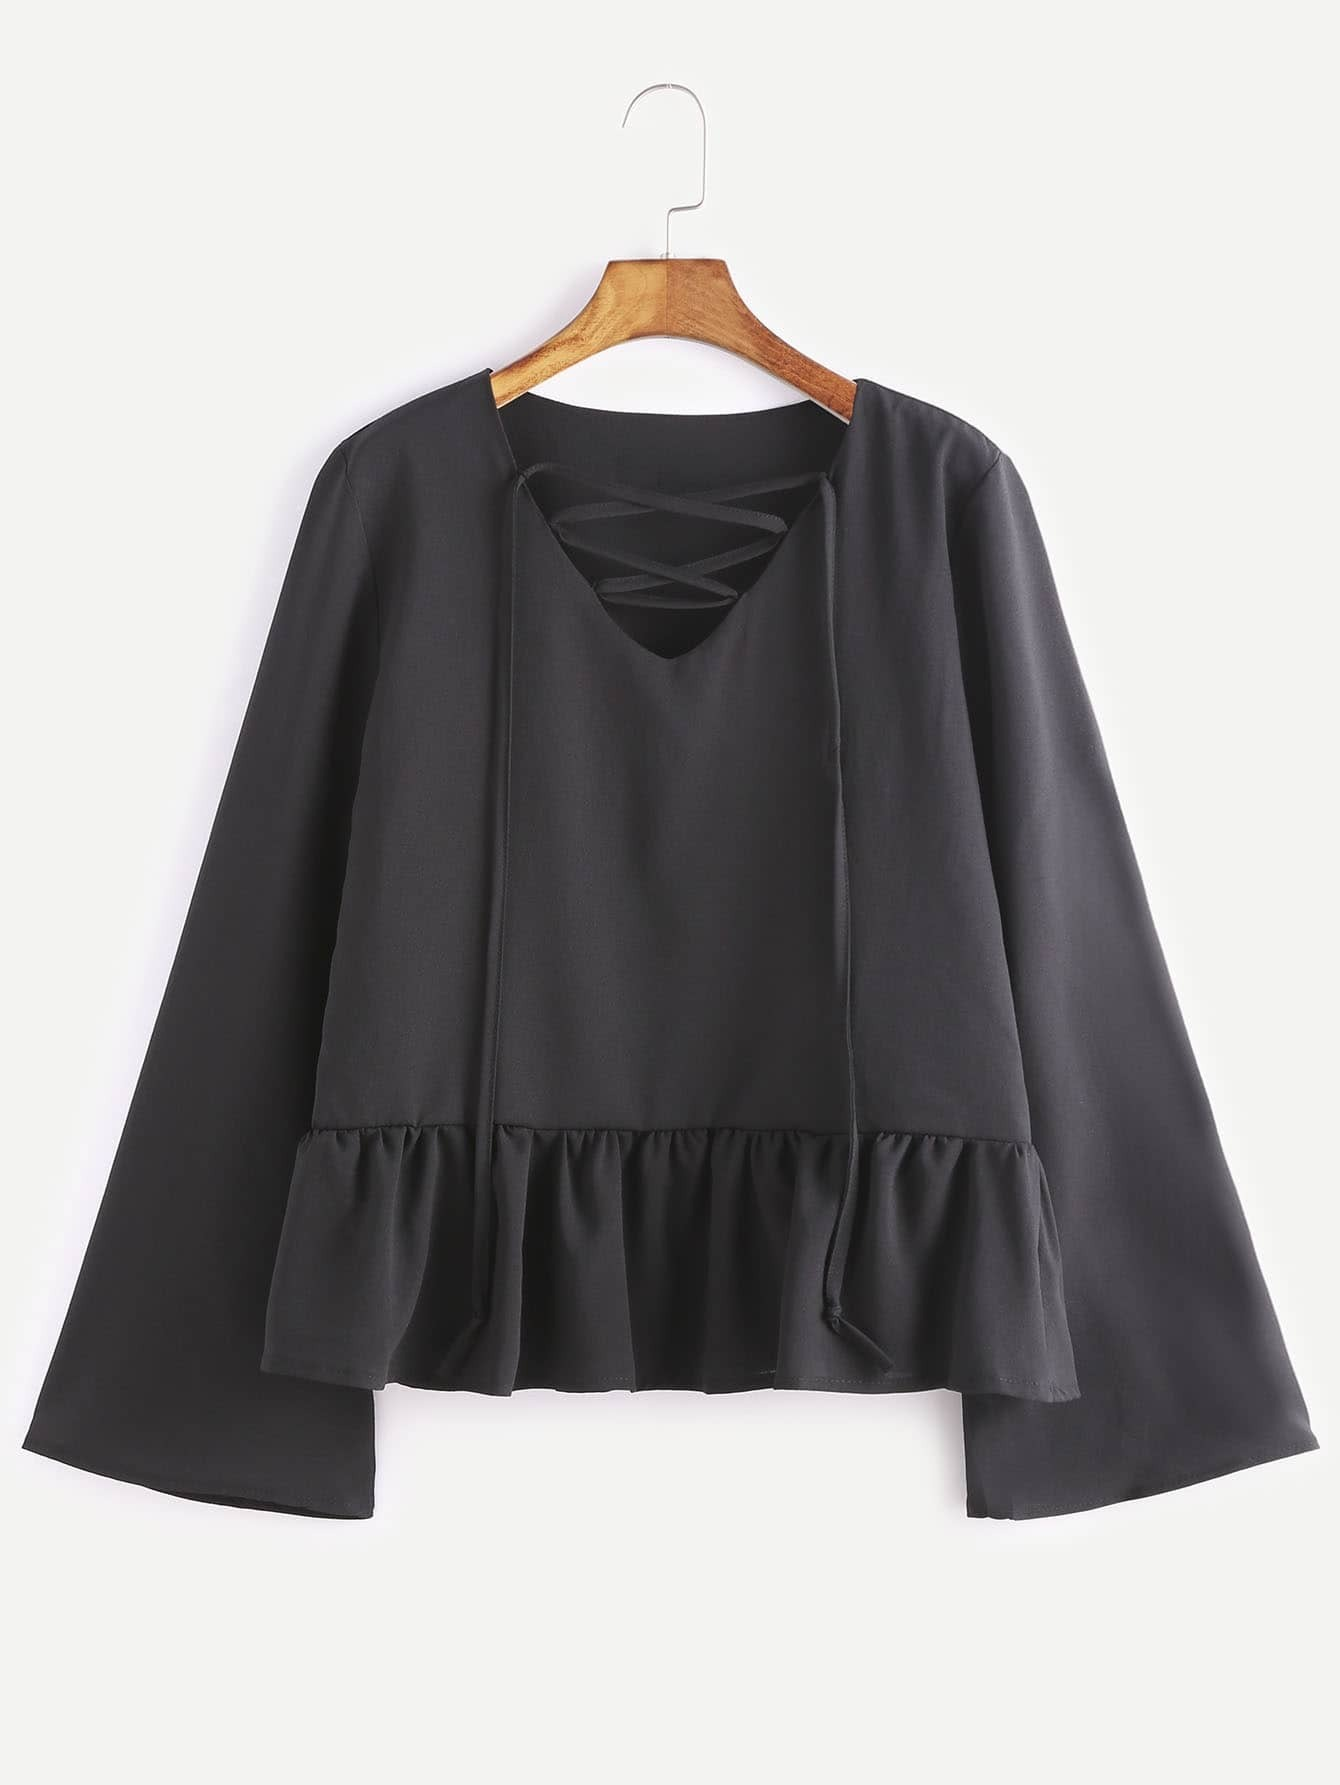 Black V Neck Lace Up Ruffle Hem Blouse blouse161123101